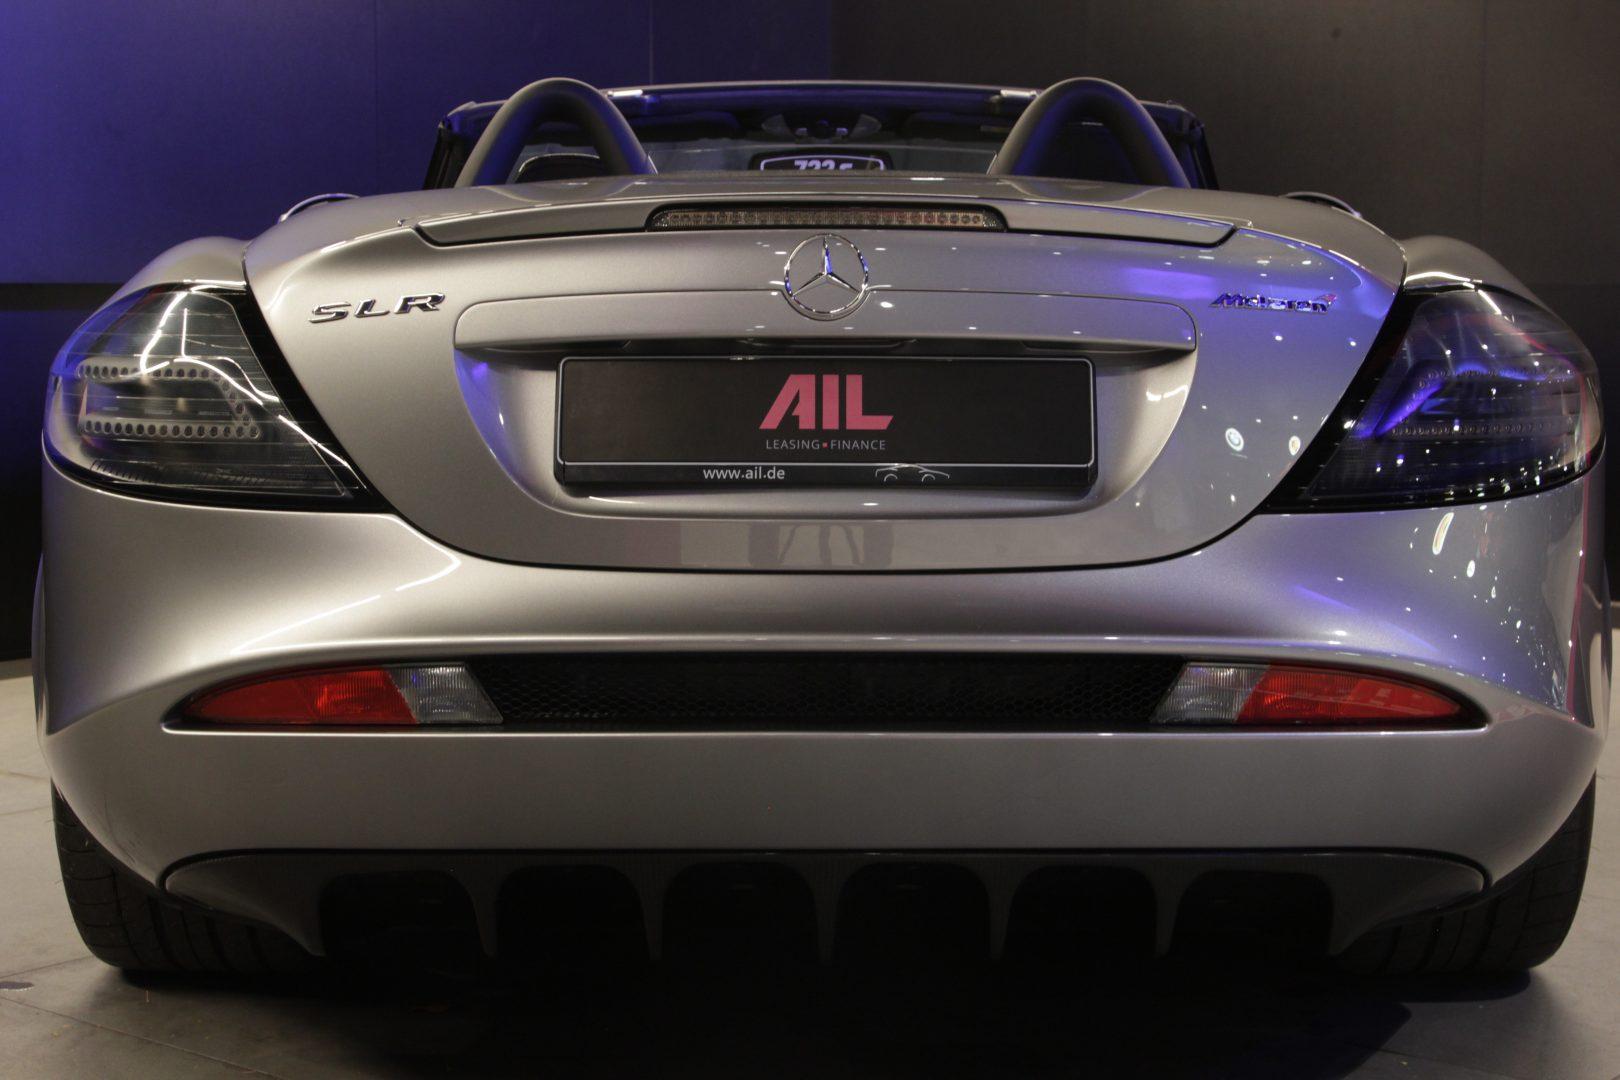 AIL Mercedes-Benz SLR McLaren Roadster 722 S 1